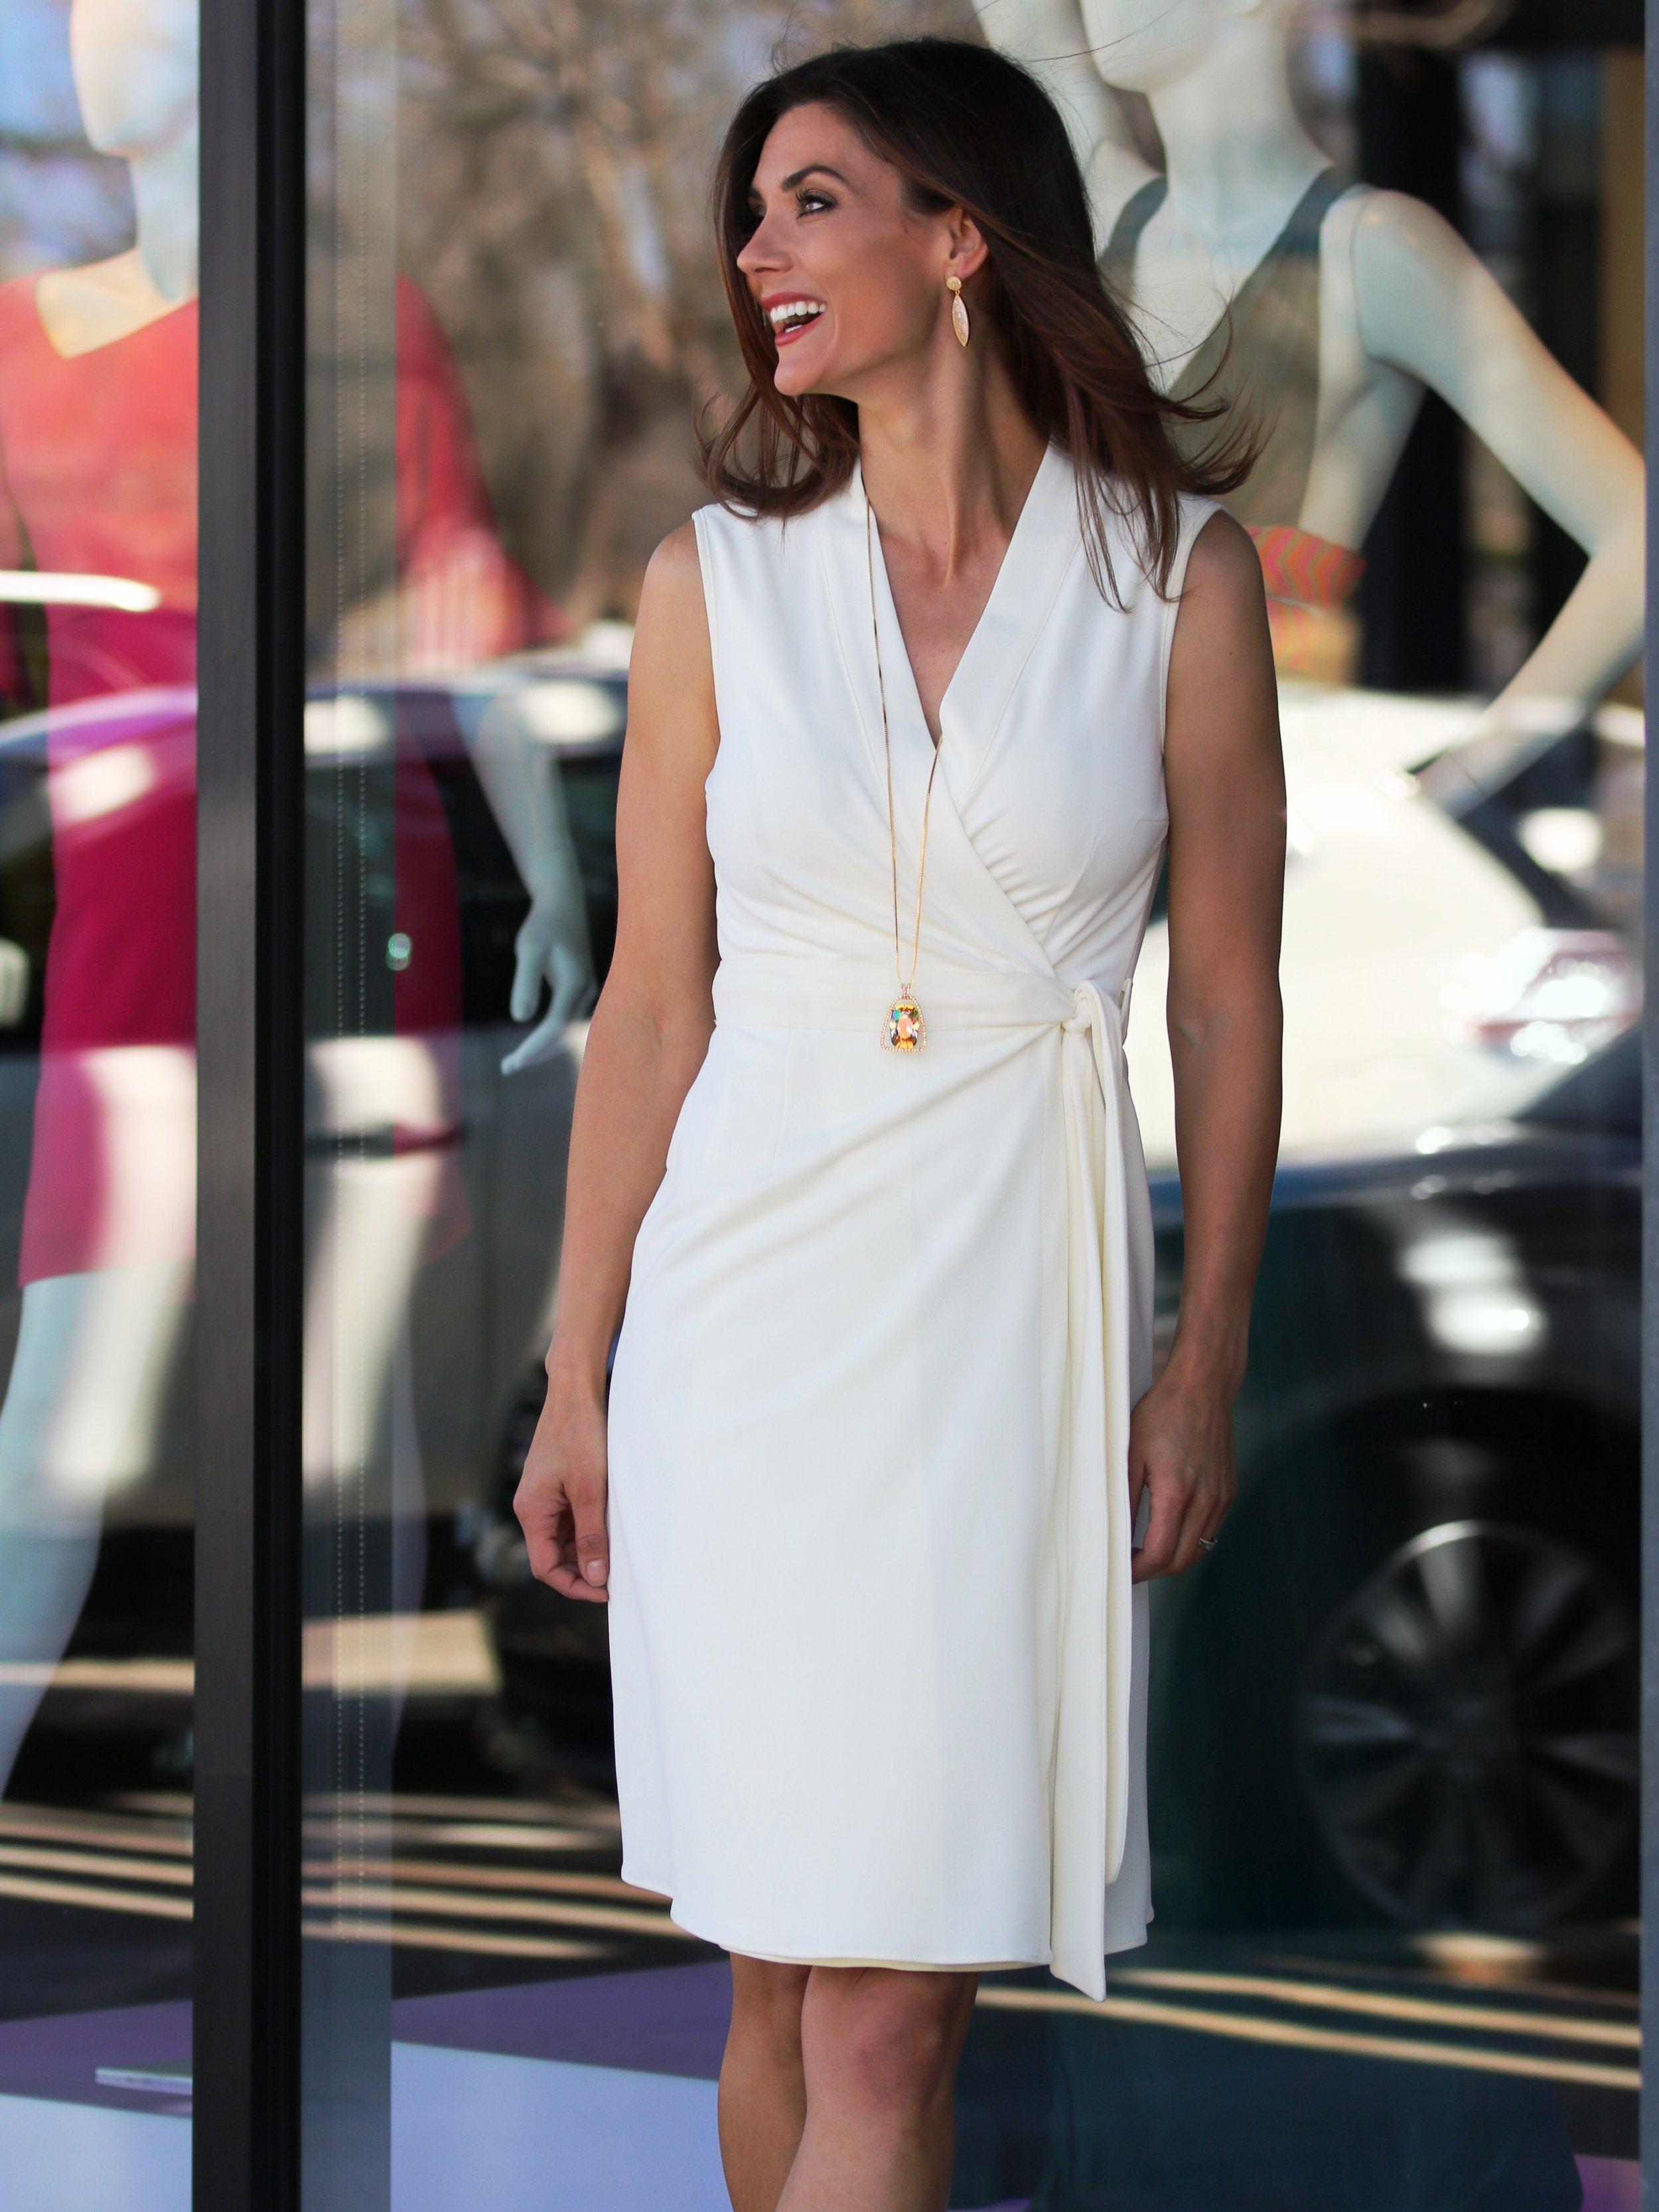 Juliana Wrap Dress